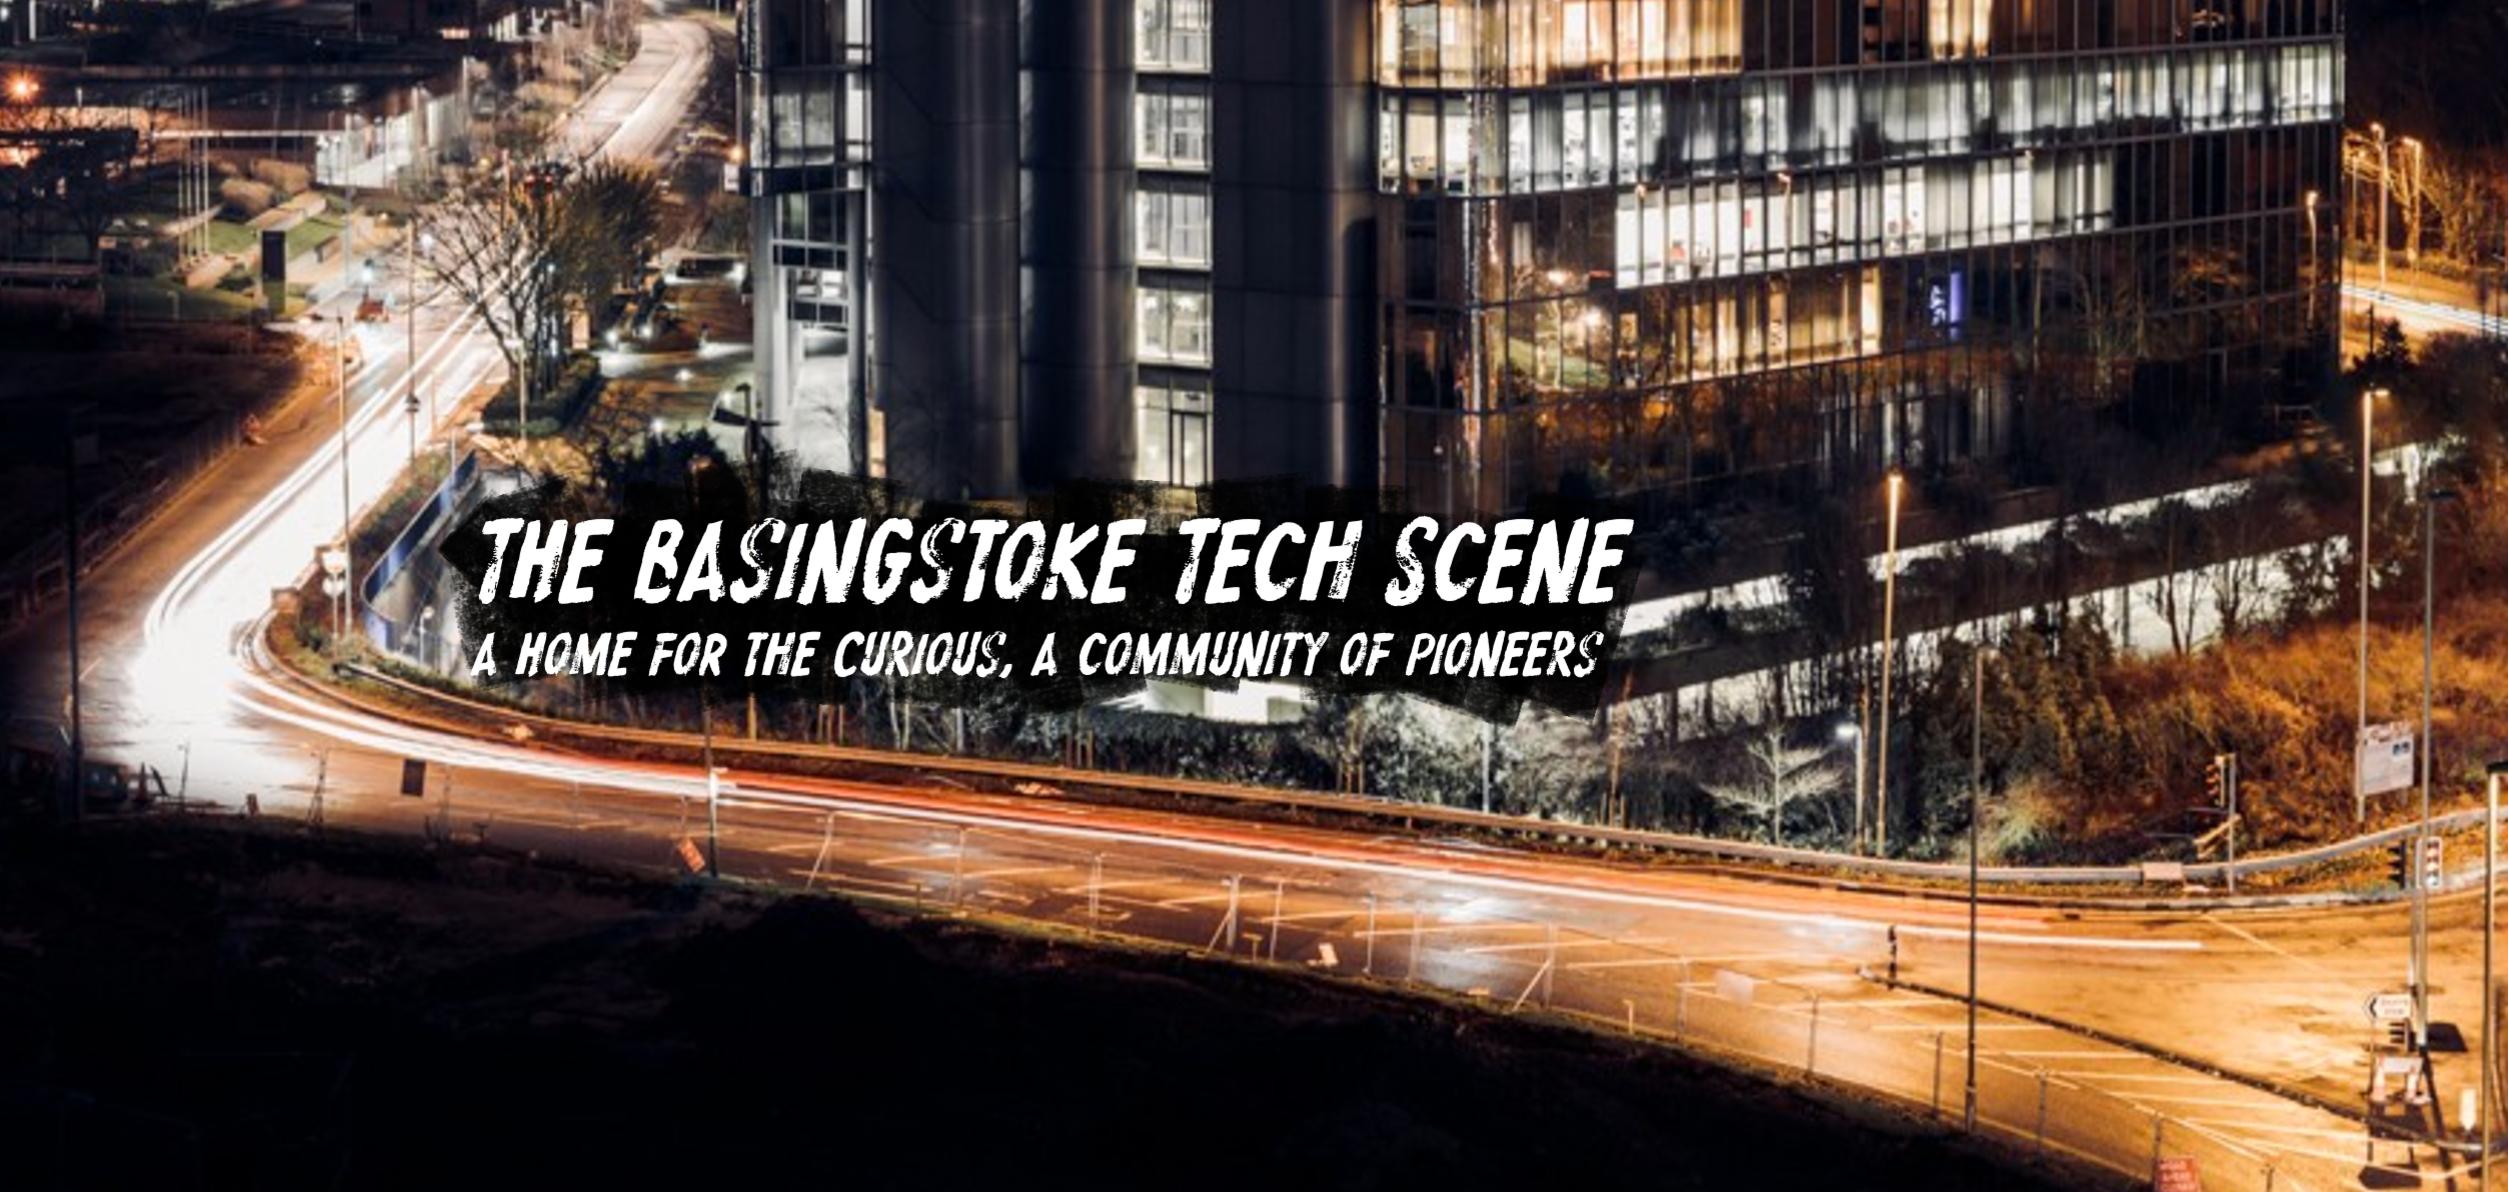 The Basingstoke Tech Scene